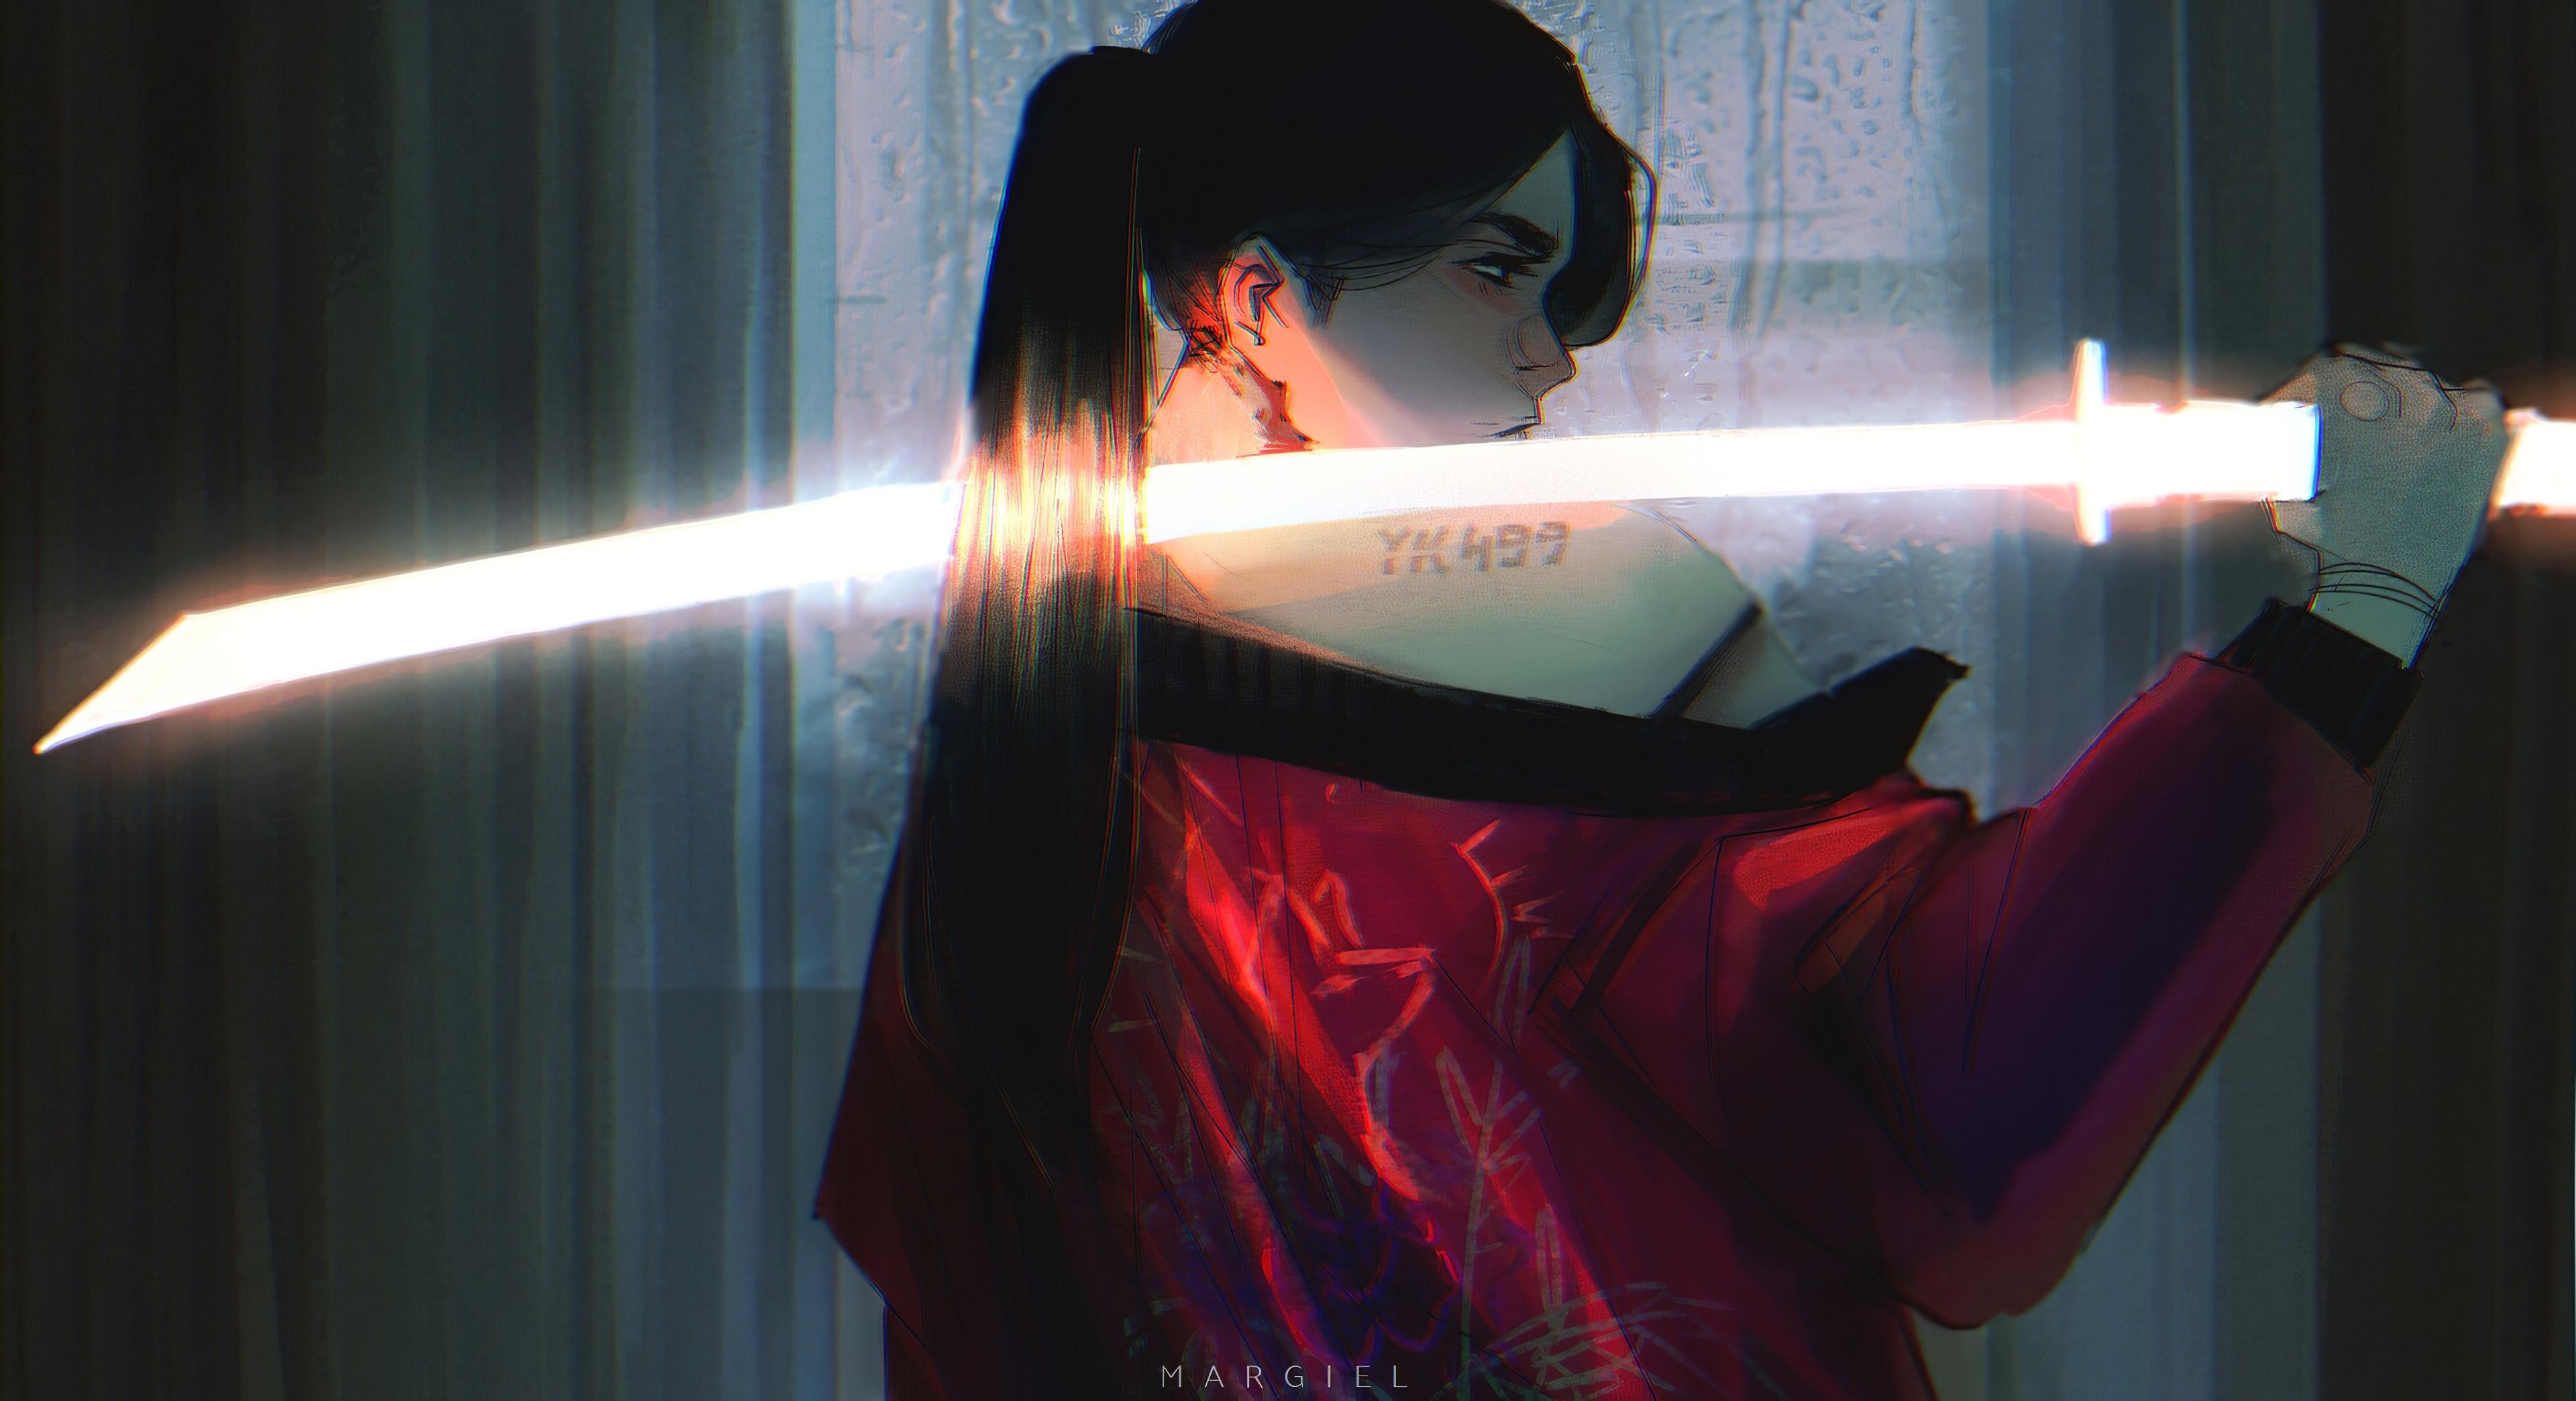 pony tail samurai girl 1578255122 - Pony Tail Samurai Girl -